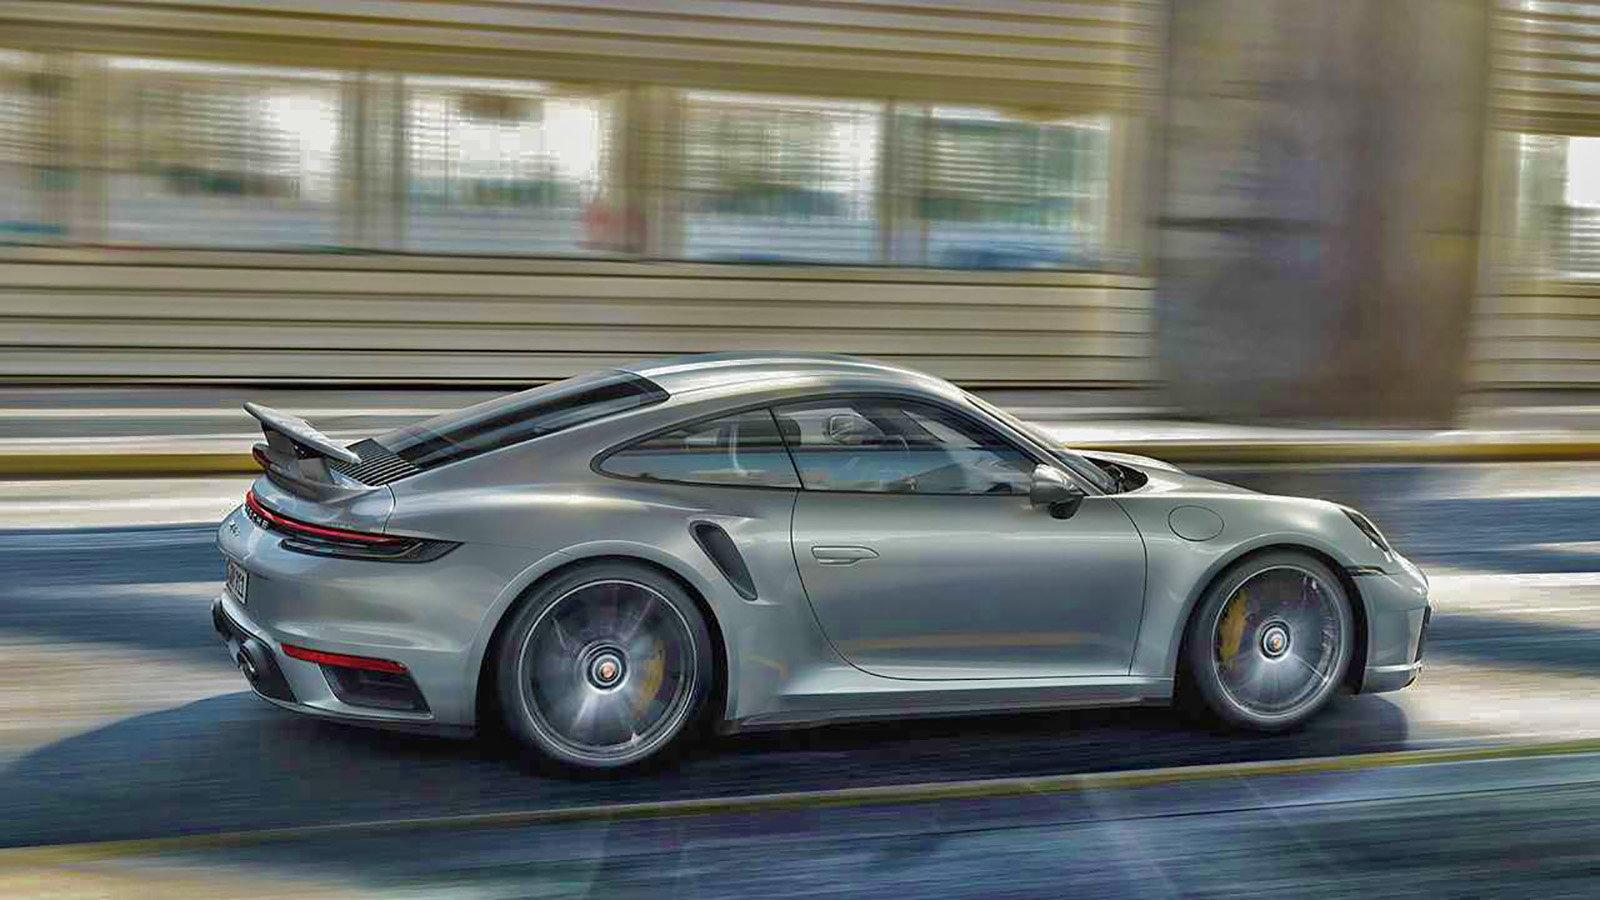 New 2021 911 Turbo S Is Faster Than Last Gen Gt2 Rs Rennlist